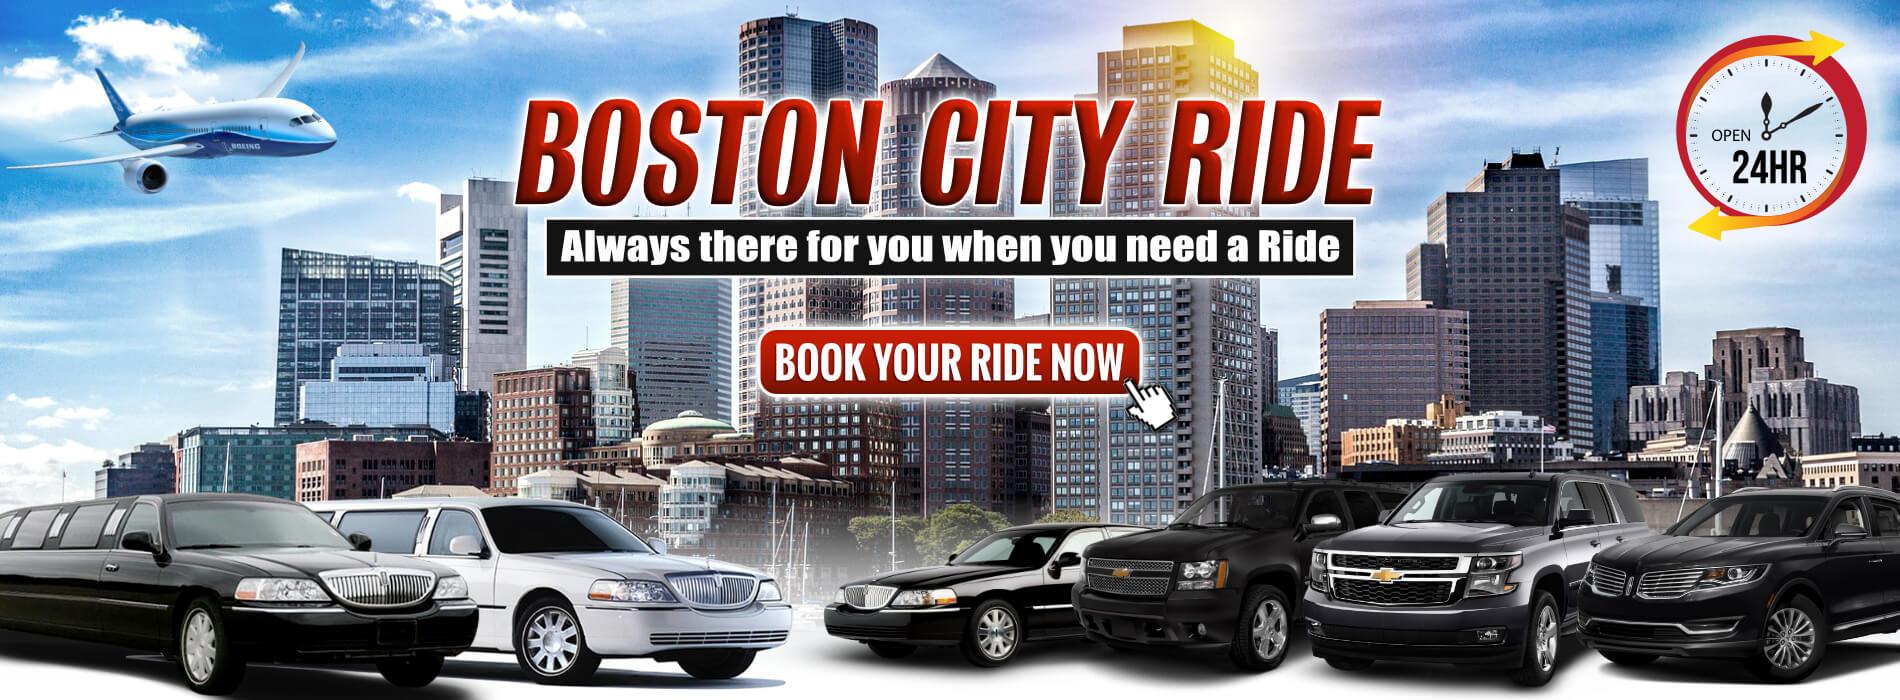 bostoncityride-Nov-20-header-One John Mathew